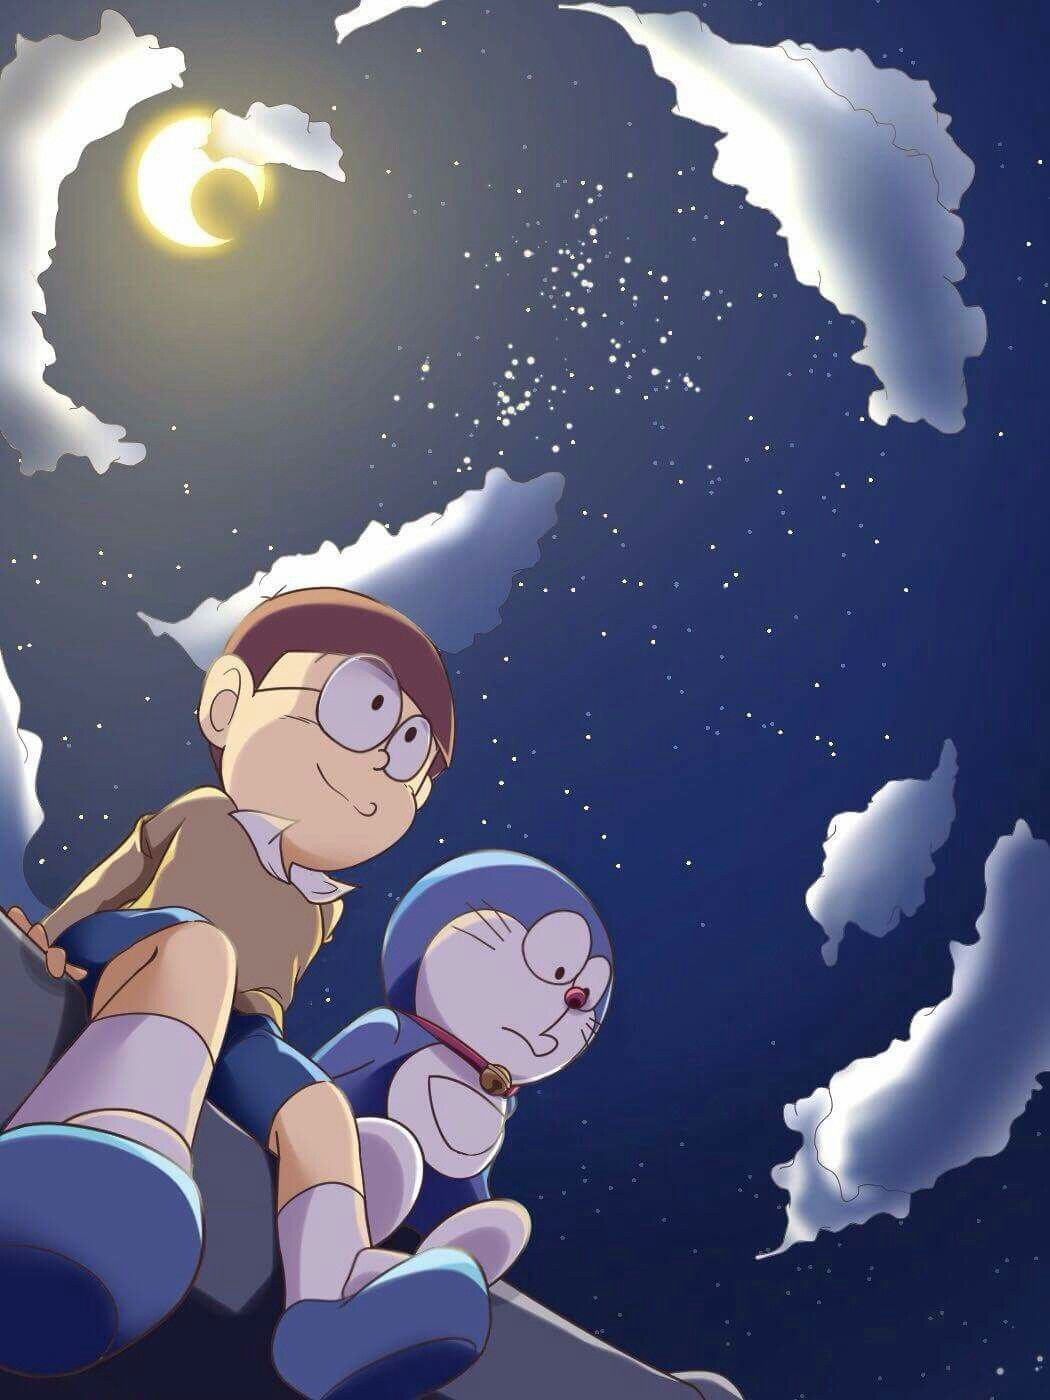 Doraemon Noby Doraemon Cartoon Doraemon Wallpapers Doraemon